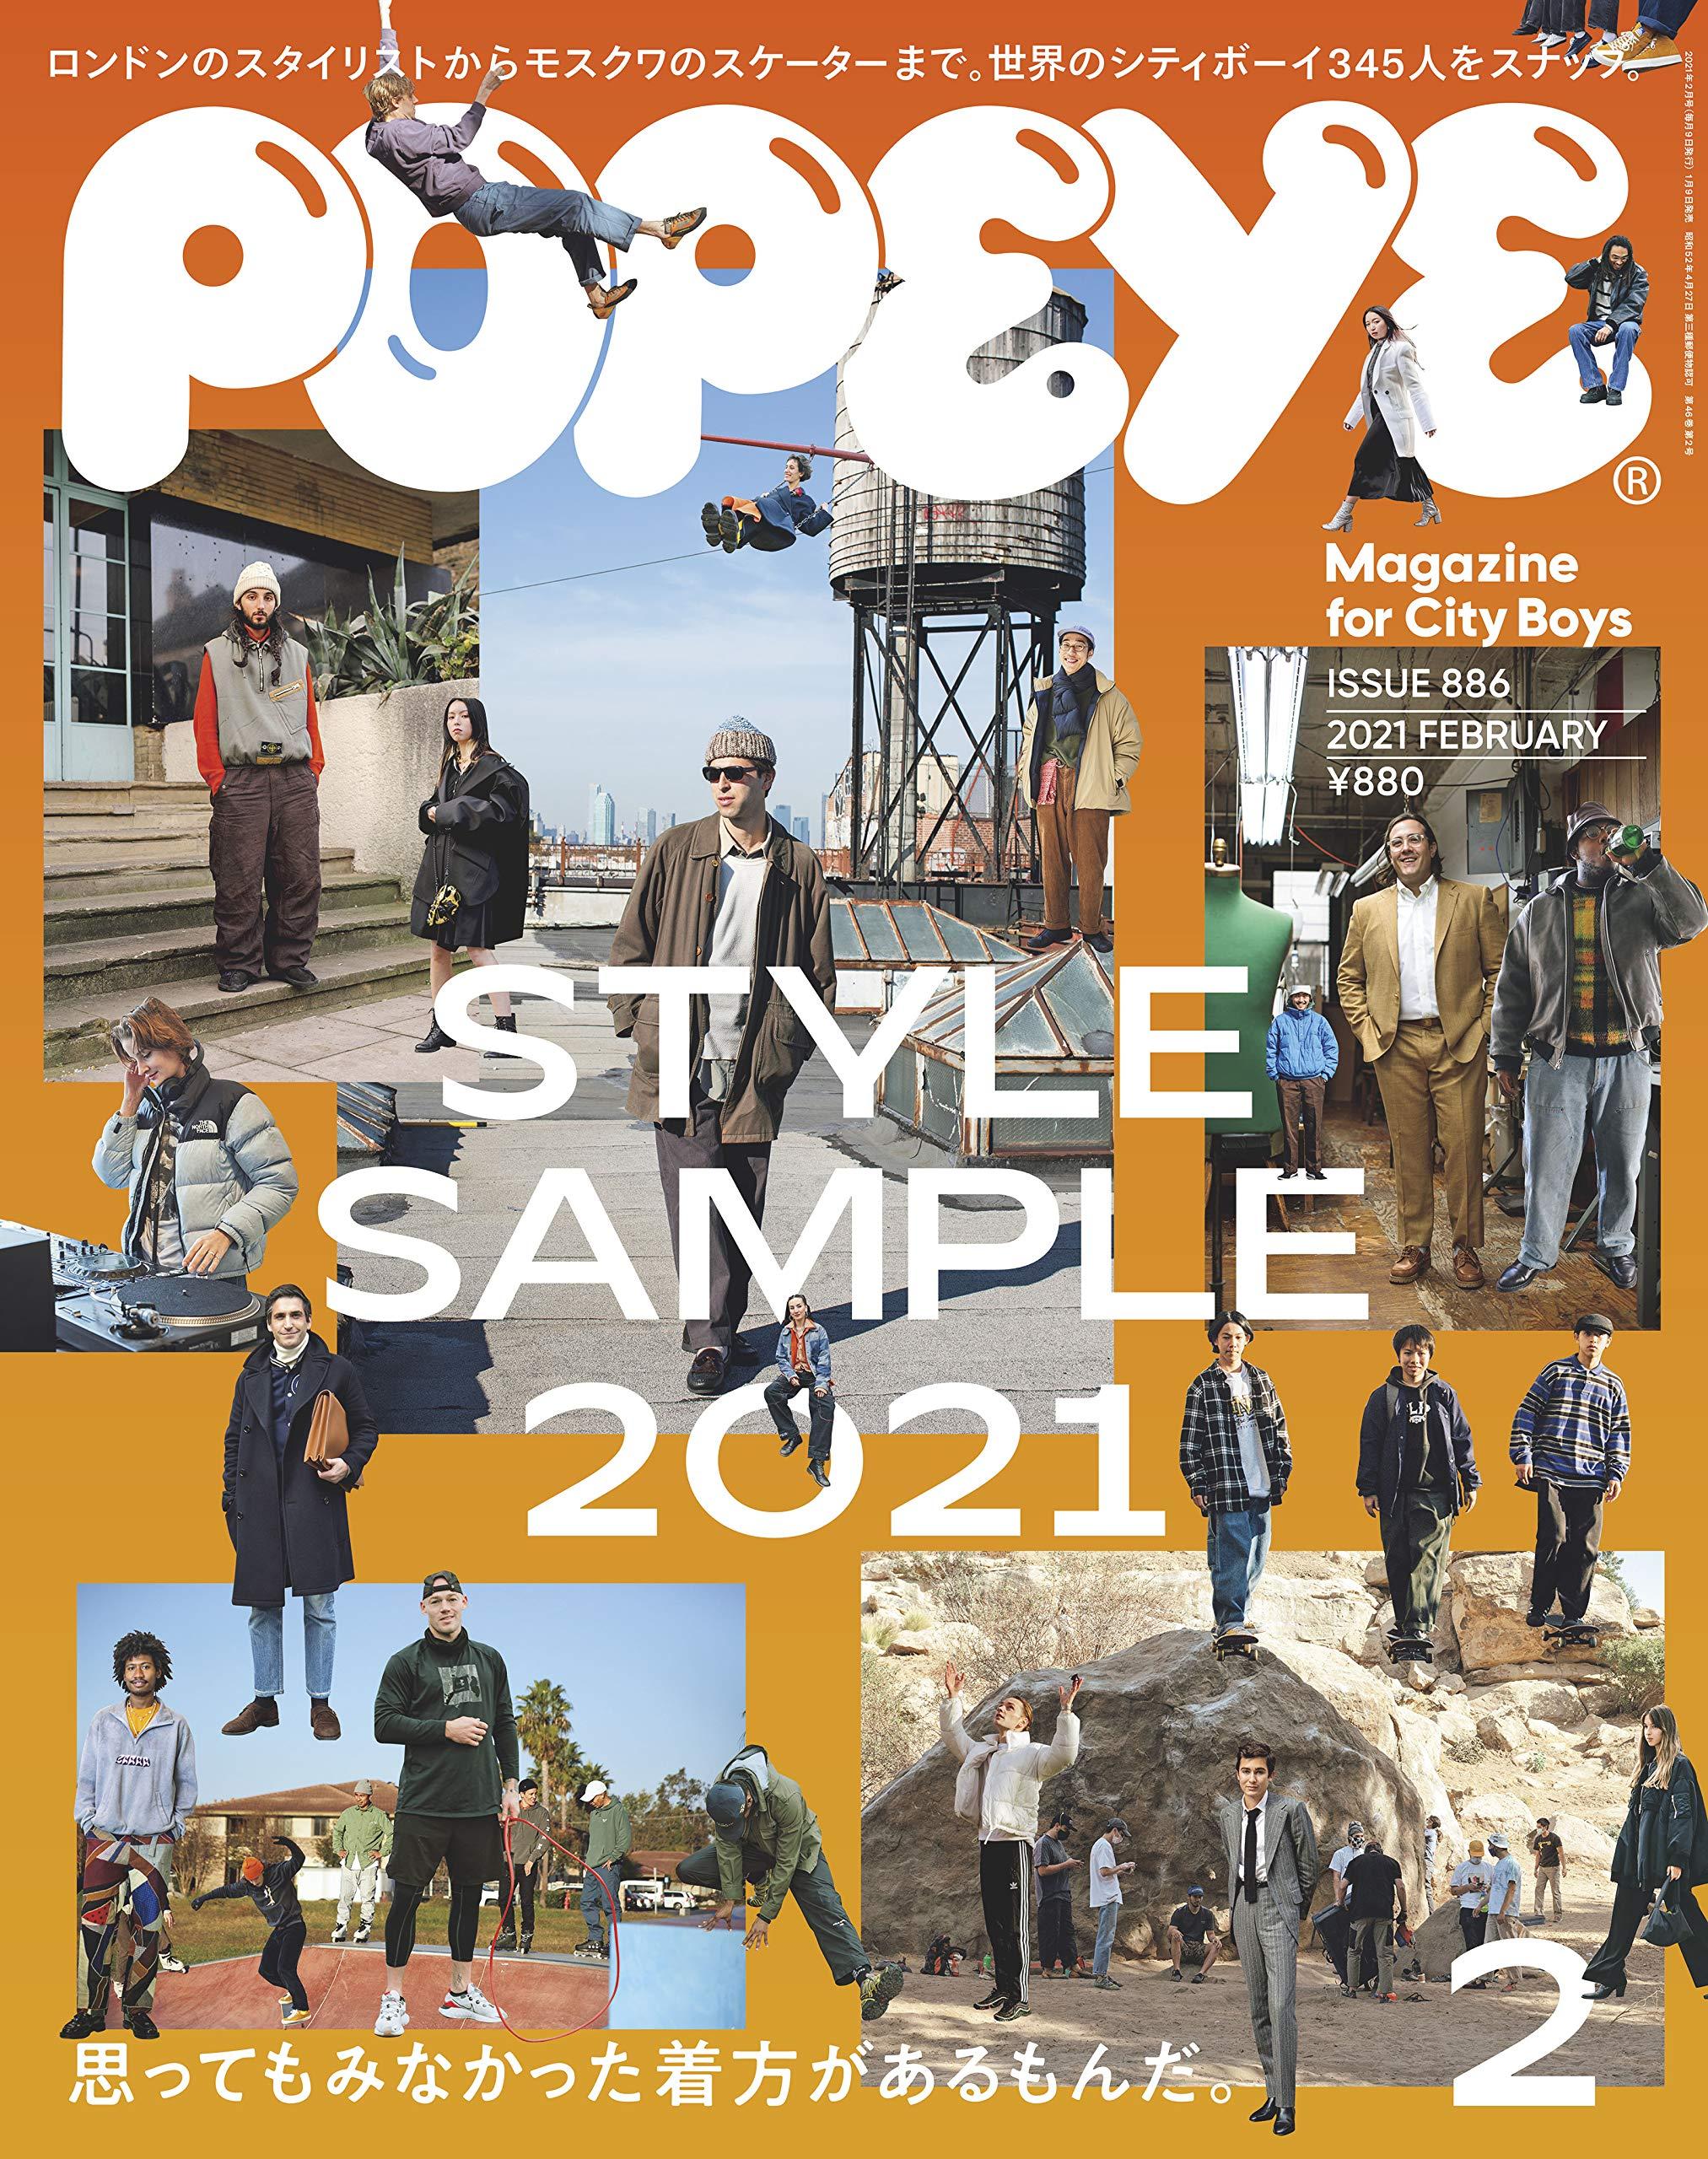 『POPEYE』2021年2月号, マガジンハウス